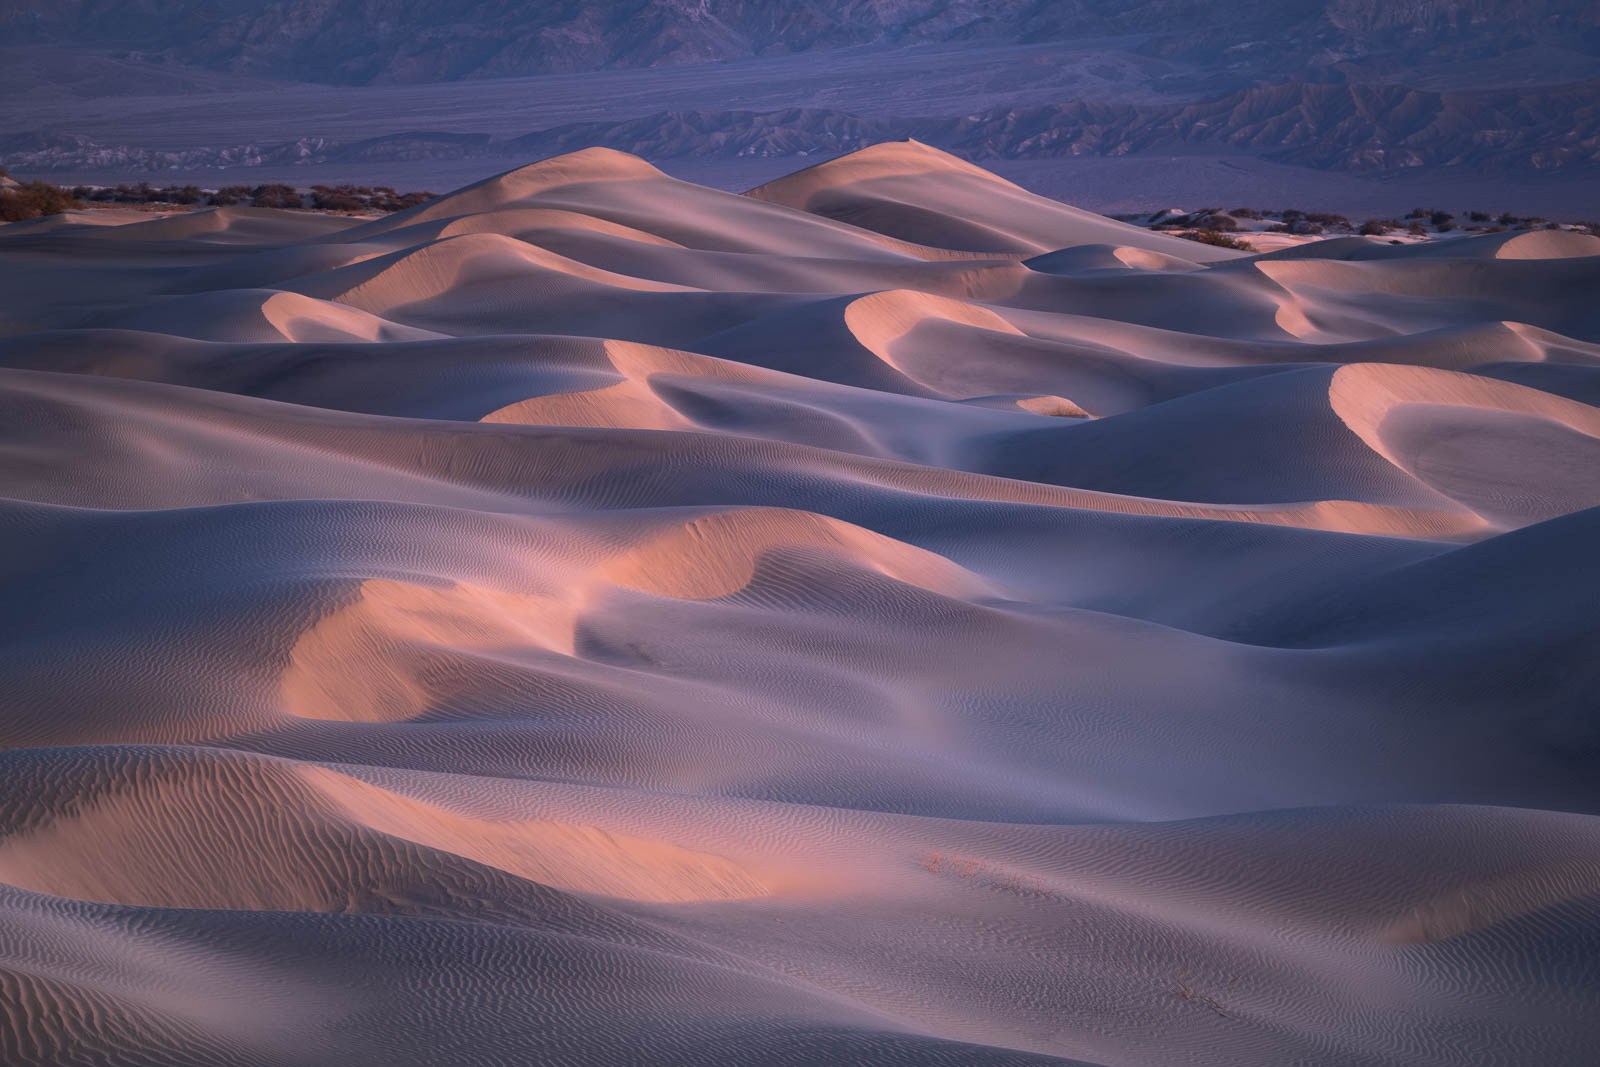 Time, Twilight, blue, california, death valley national park, landscape orientation, mesquite dunes, mojave desert, pink, sand...